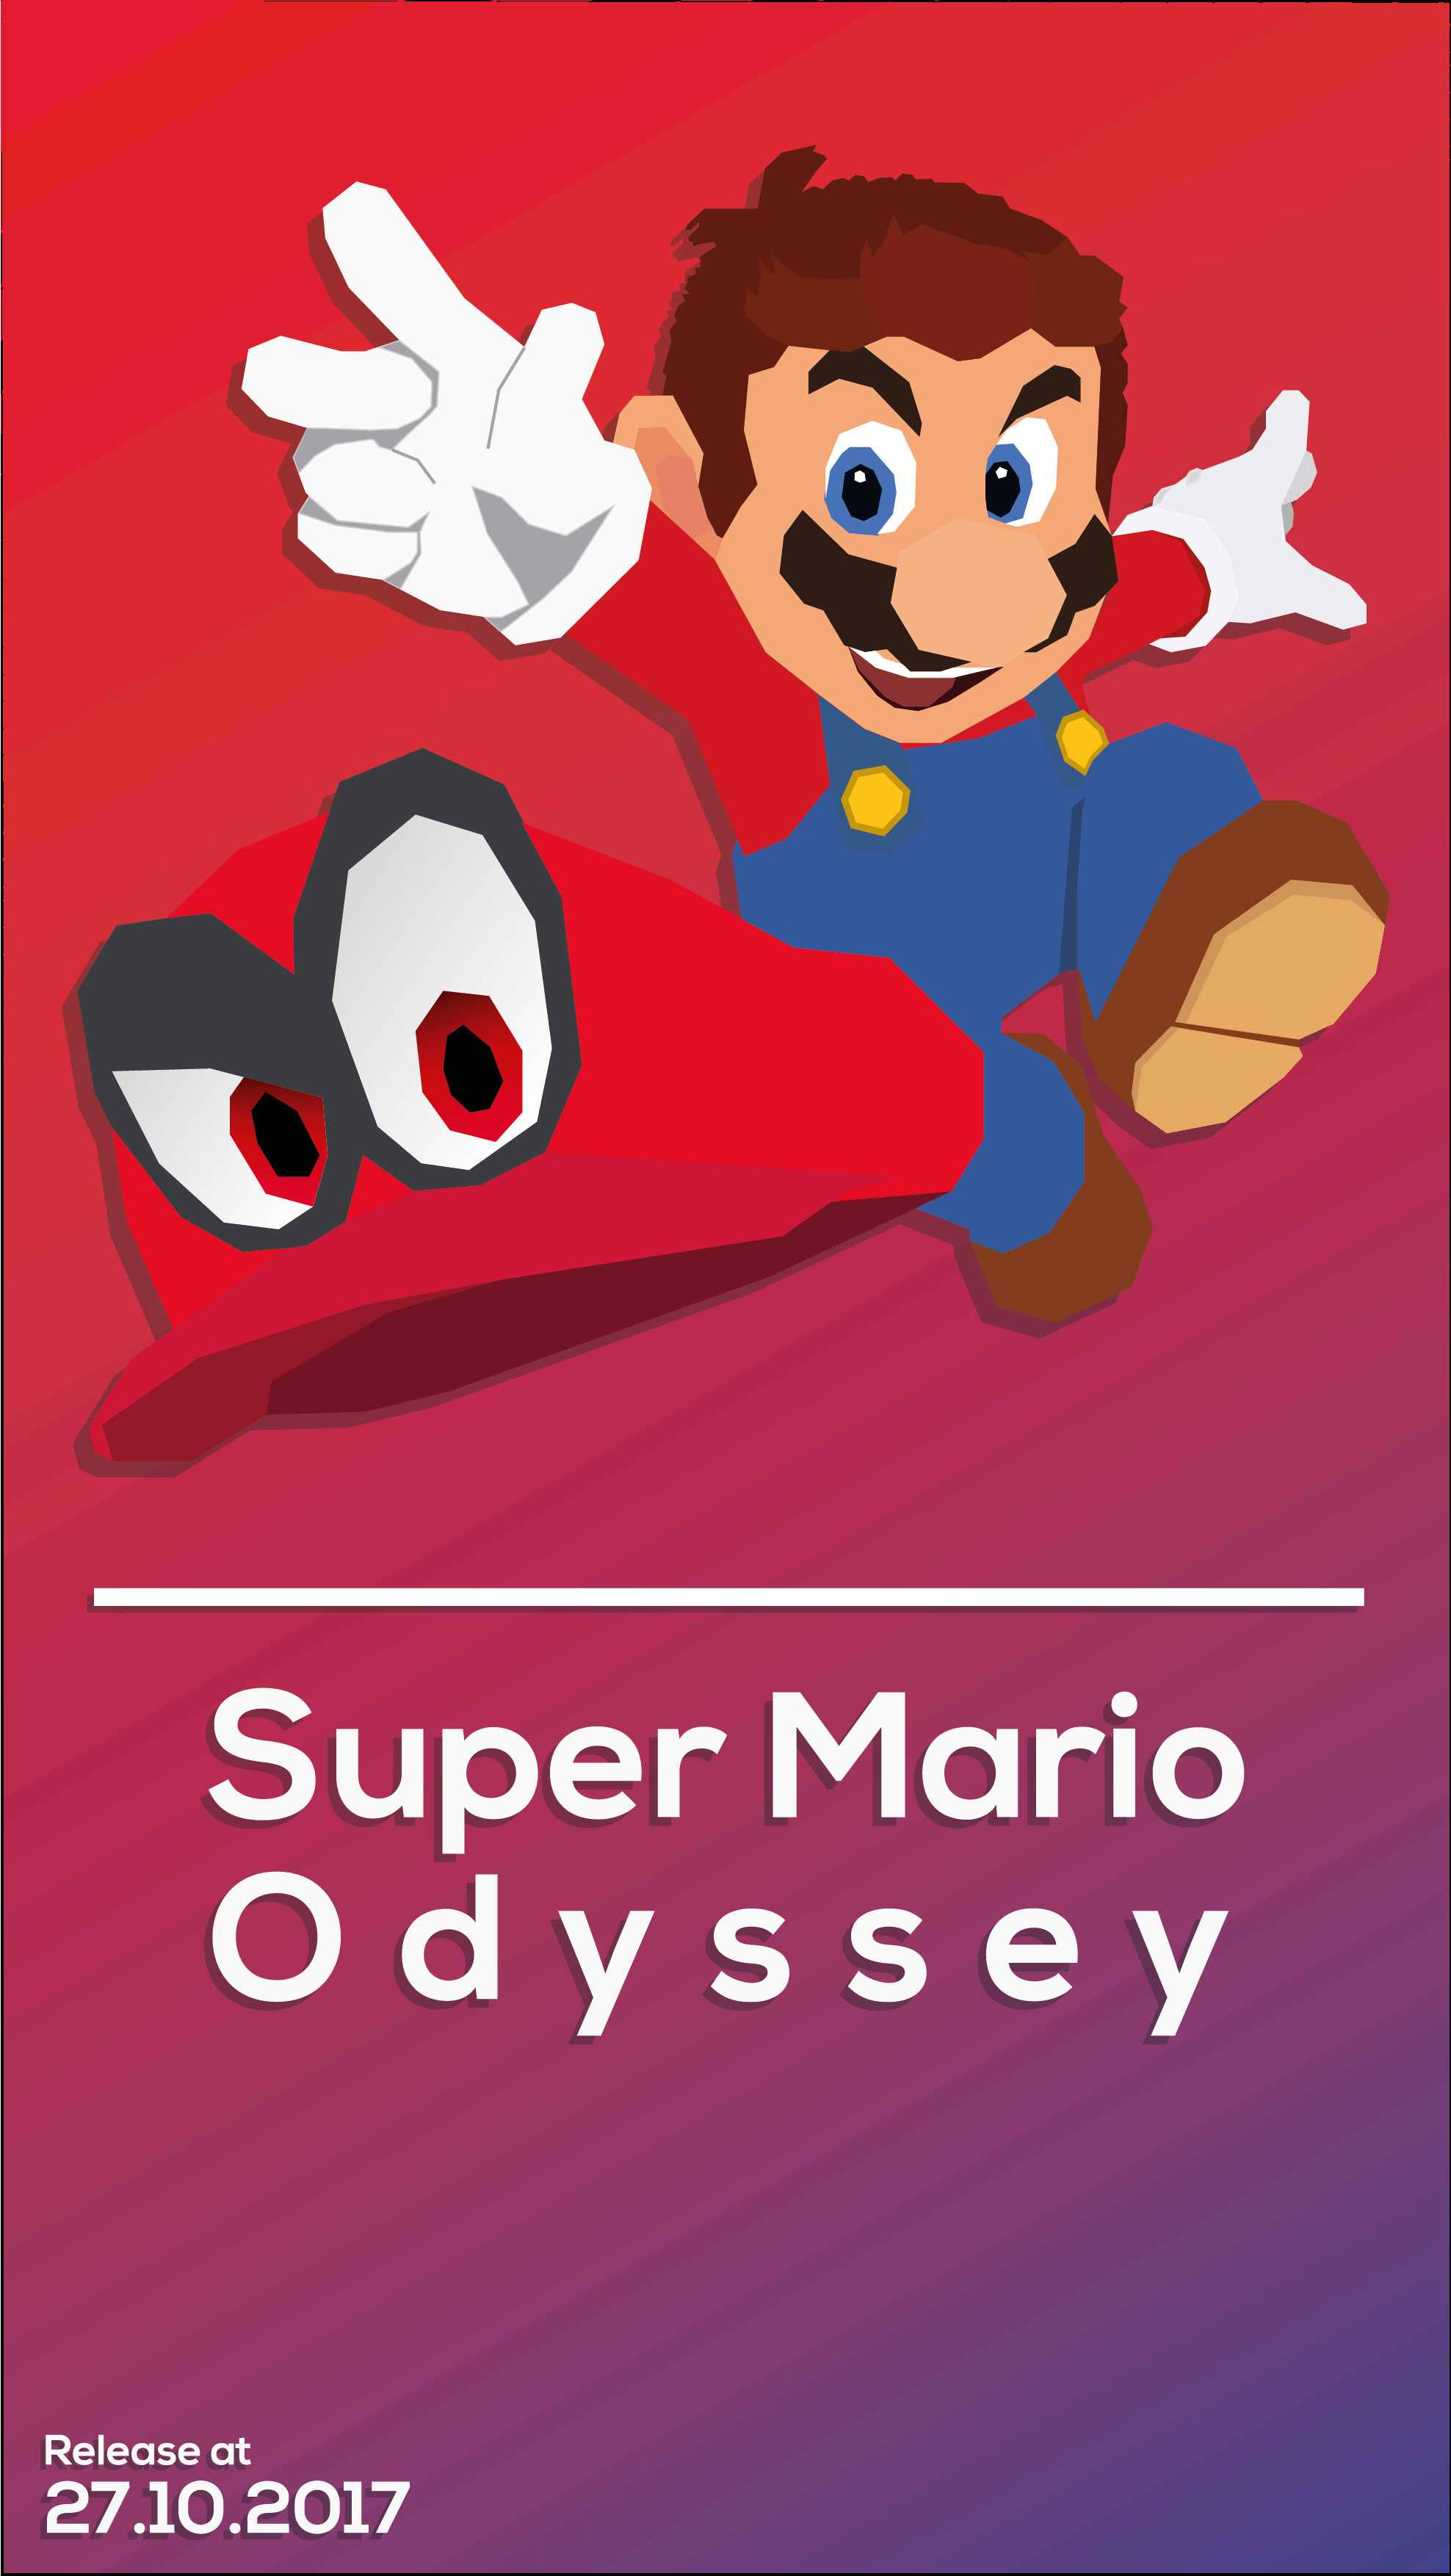 Super Mario Odyssey Phone Wallpaper